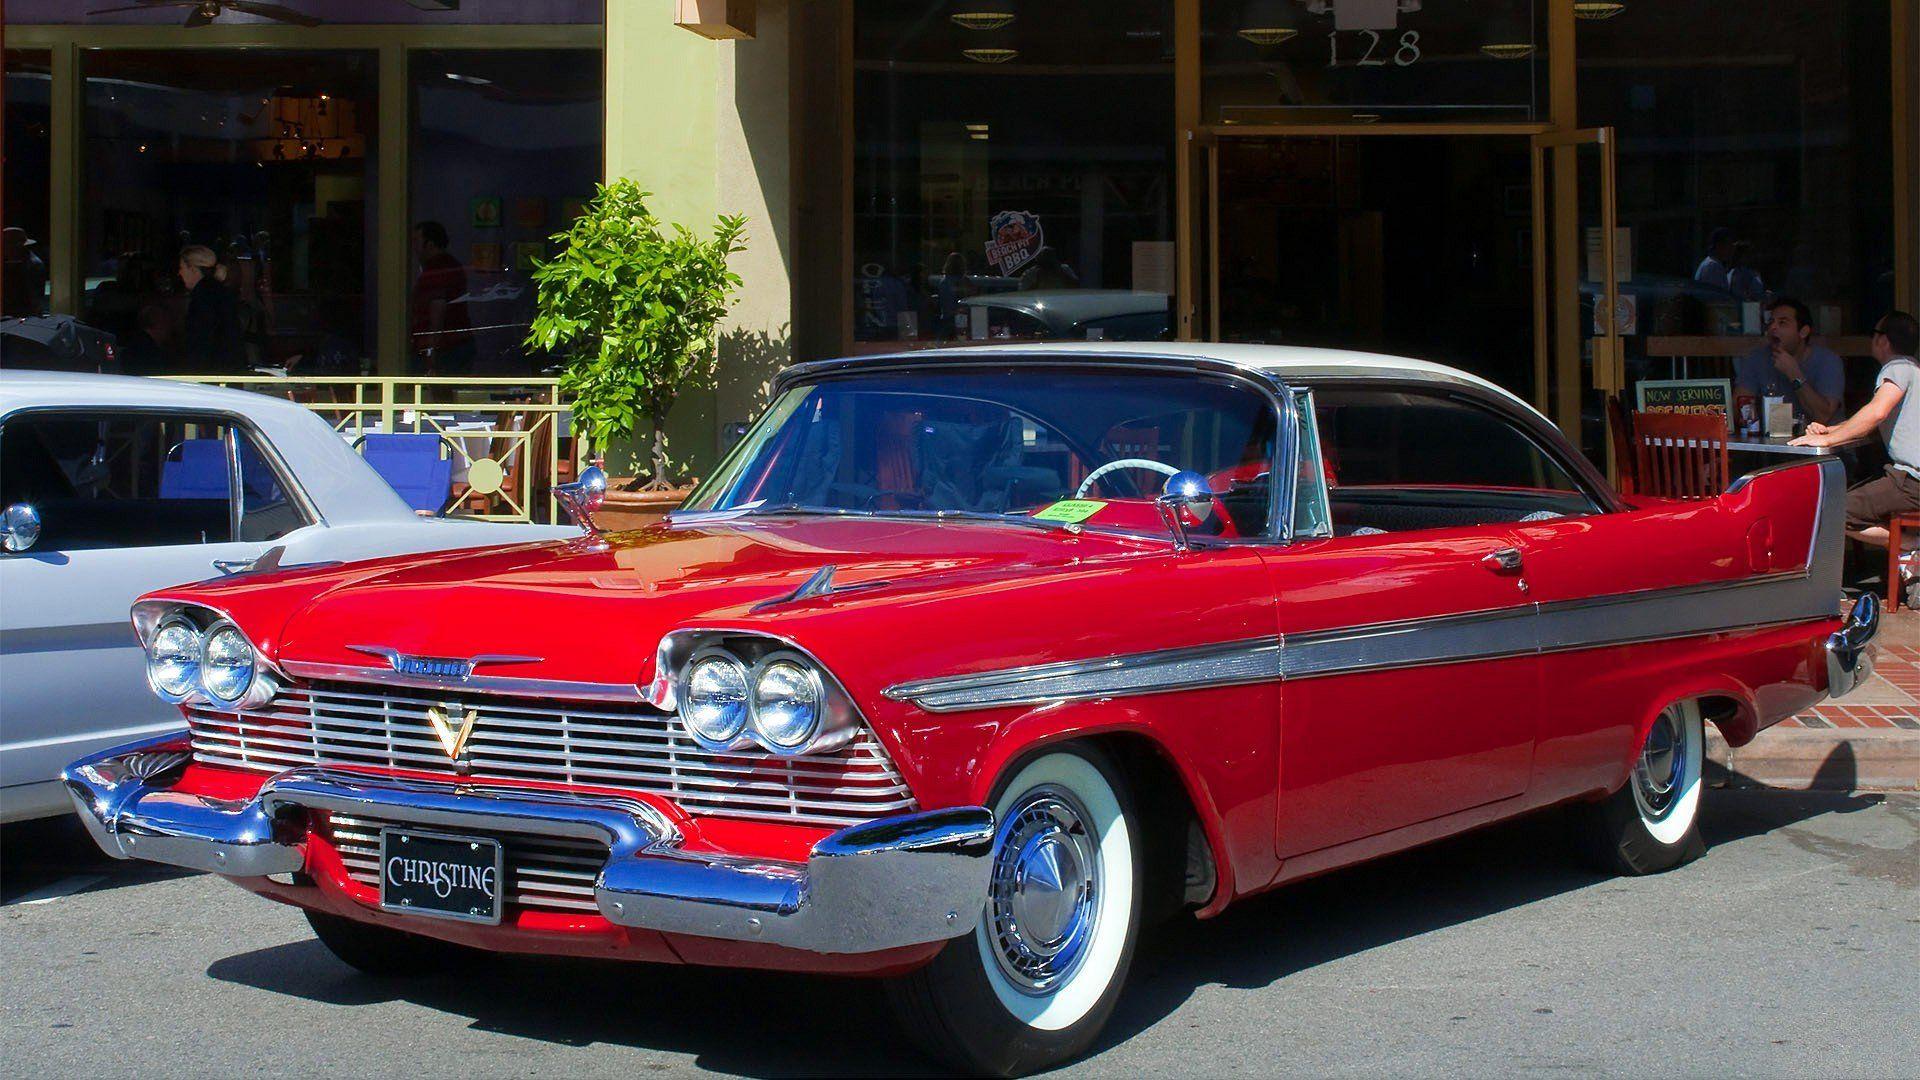 Christine 1958 Plymouth Fury | Cars Plymouth Fury Christine (movie ...